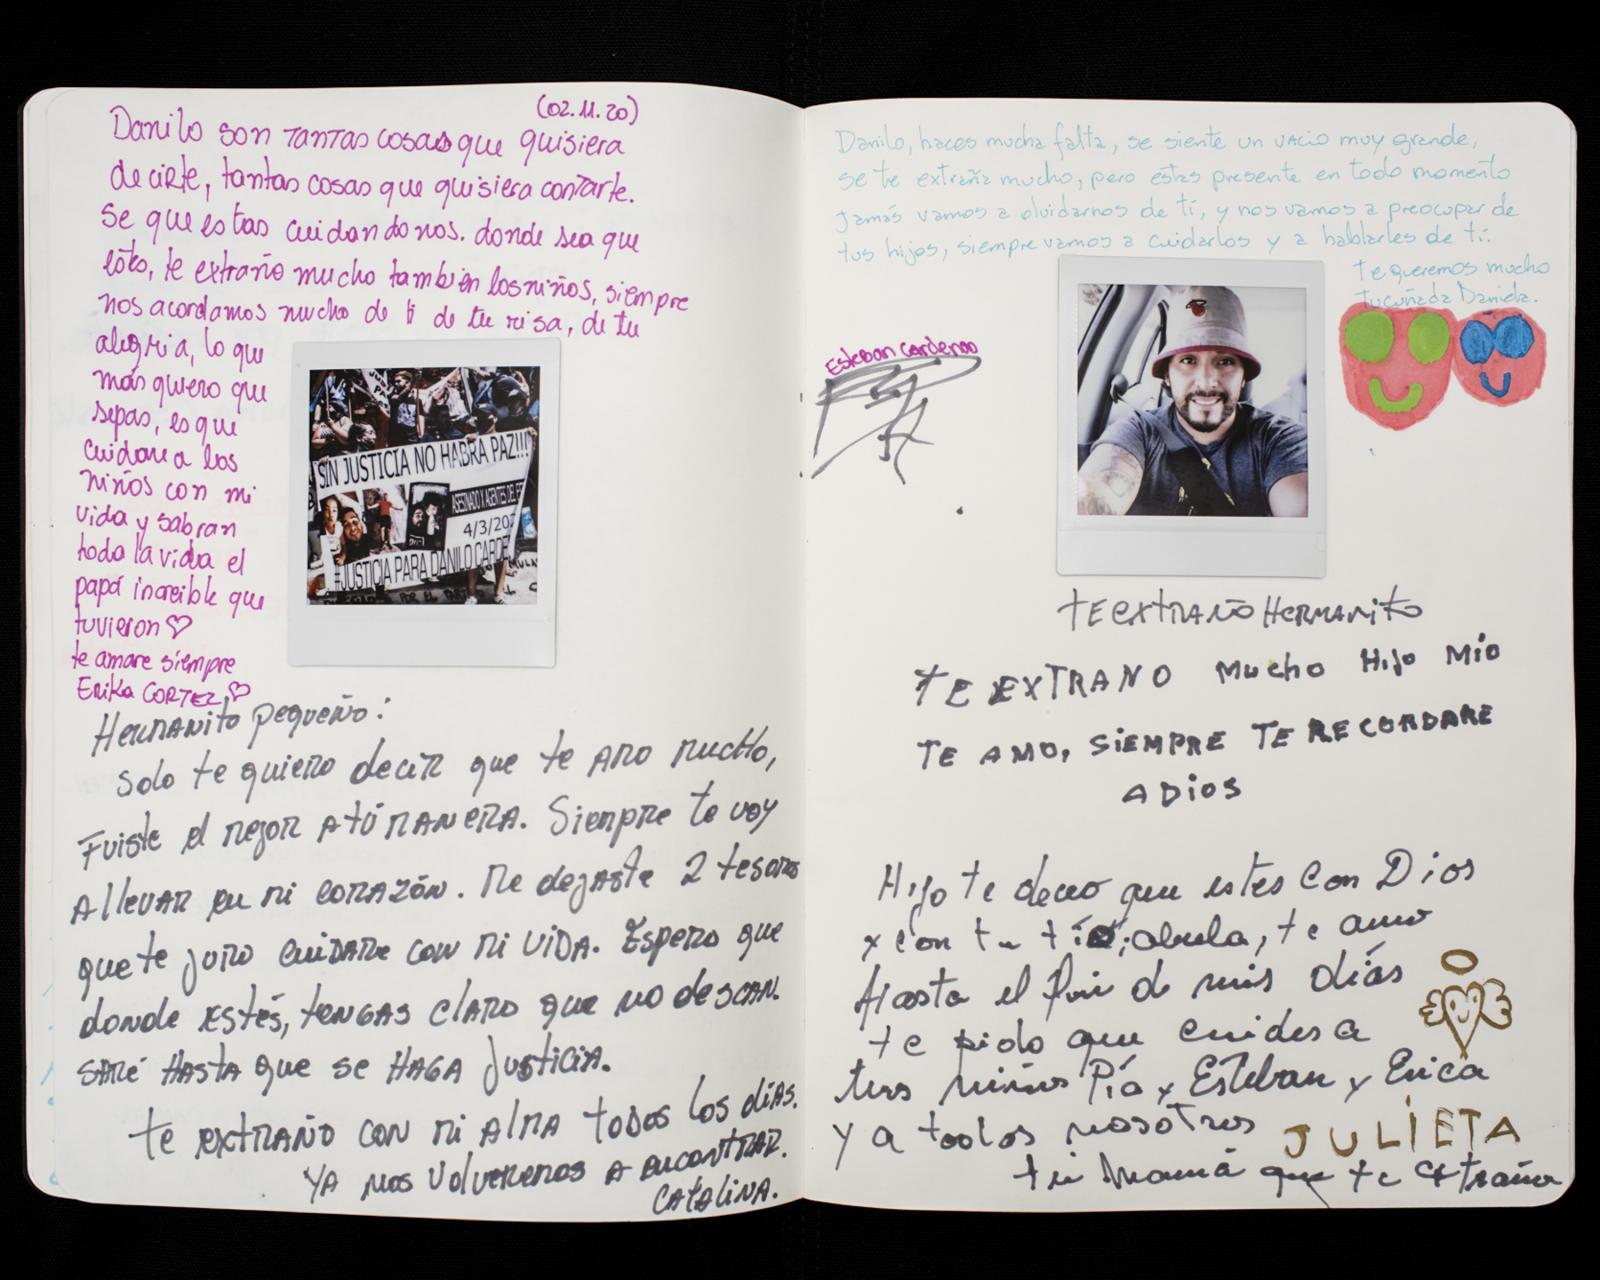 Photography image - Loading notebook_003_JAM7028.JPG